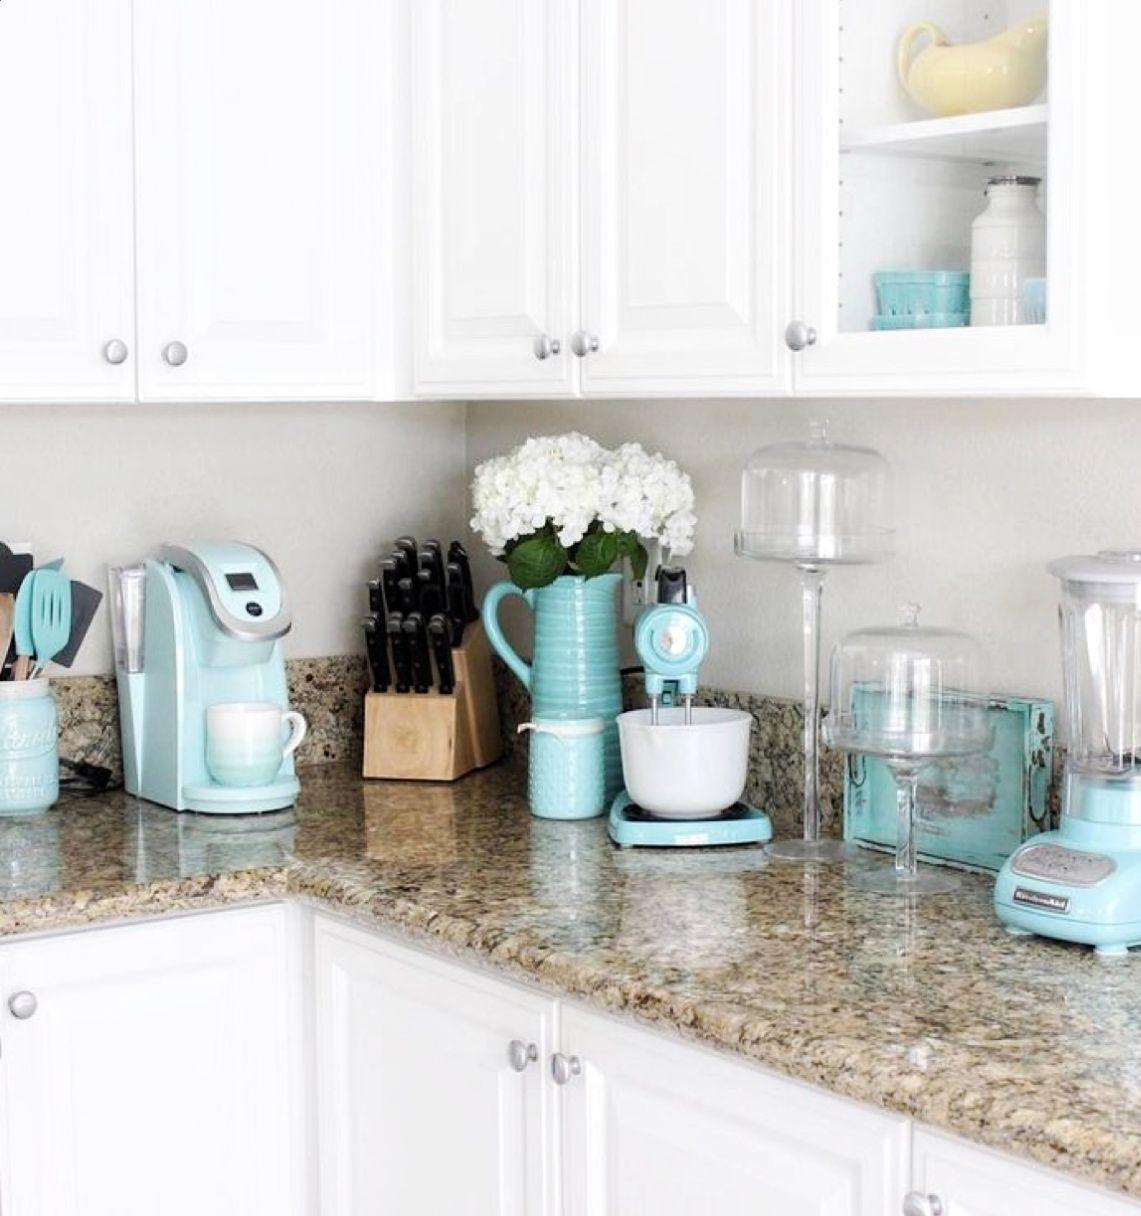 Mint Green Kitchen Decor From Amazon Diy Darlin Turquoise Kitchen Decor Aqua Kitchen Turquoise Kitchen